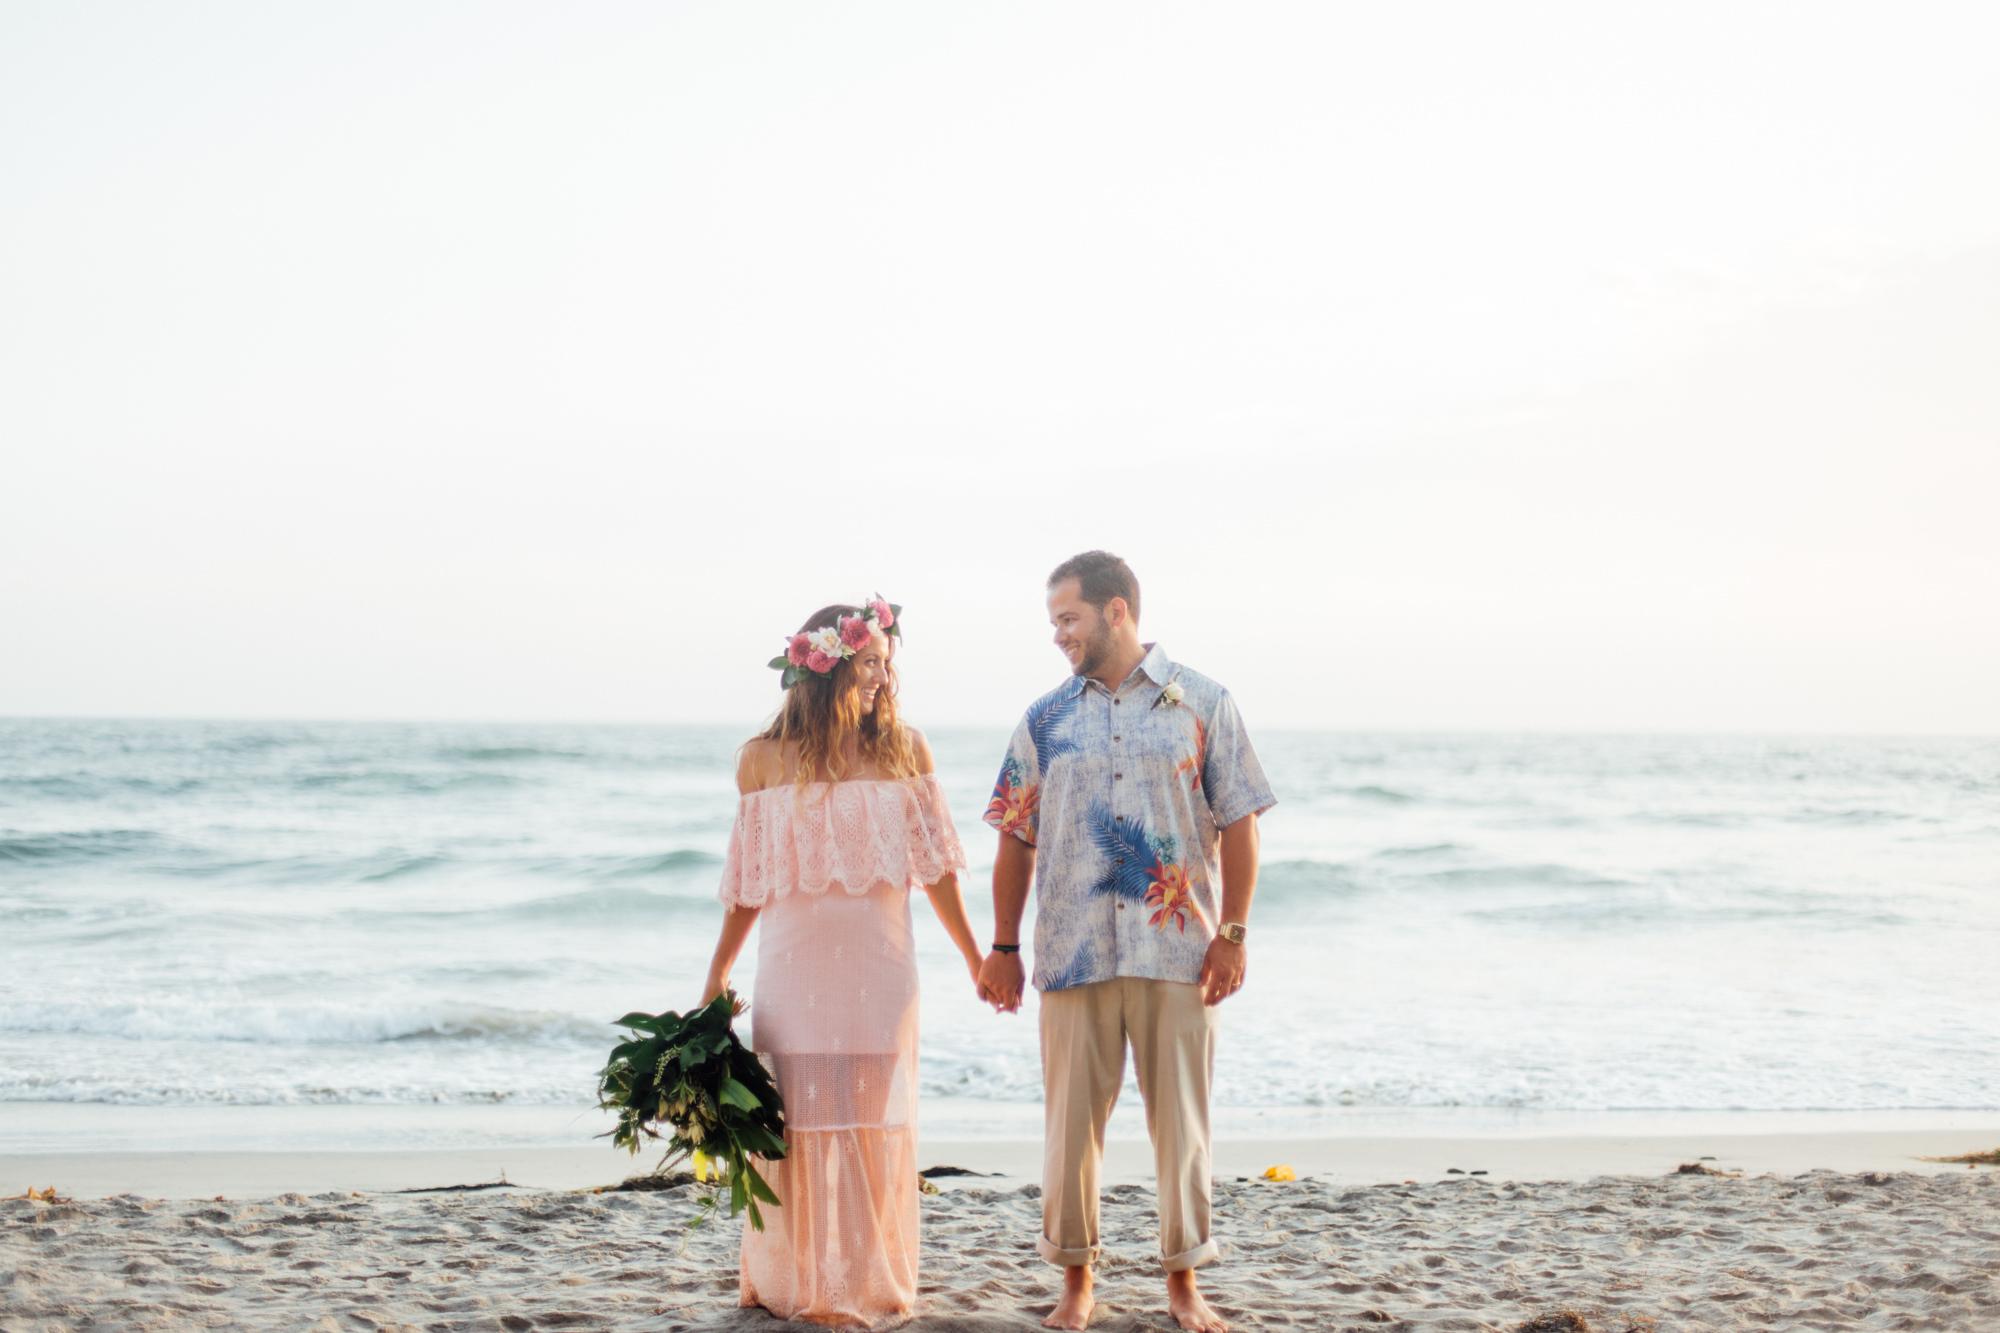 San Diego Wedding photography at Cardiff Beach042.jpg